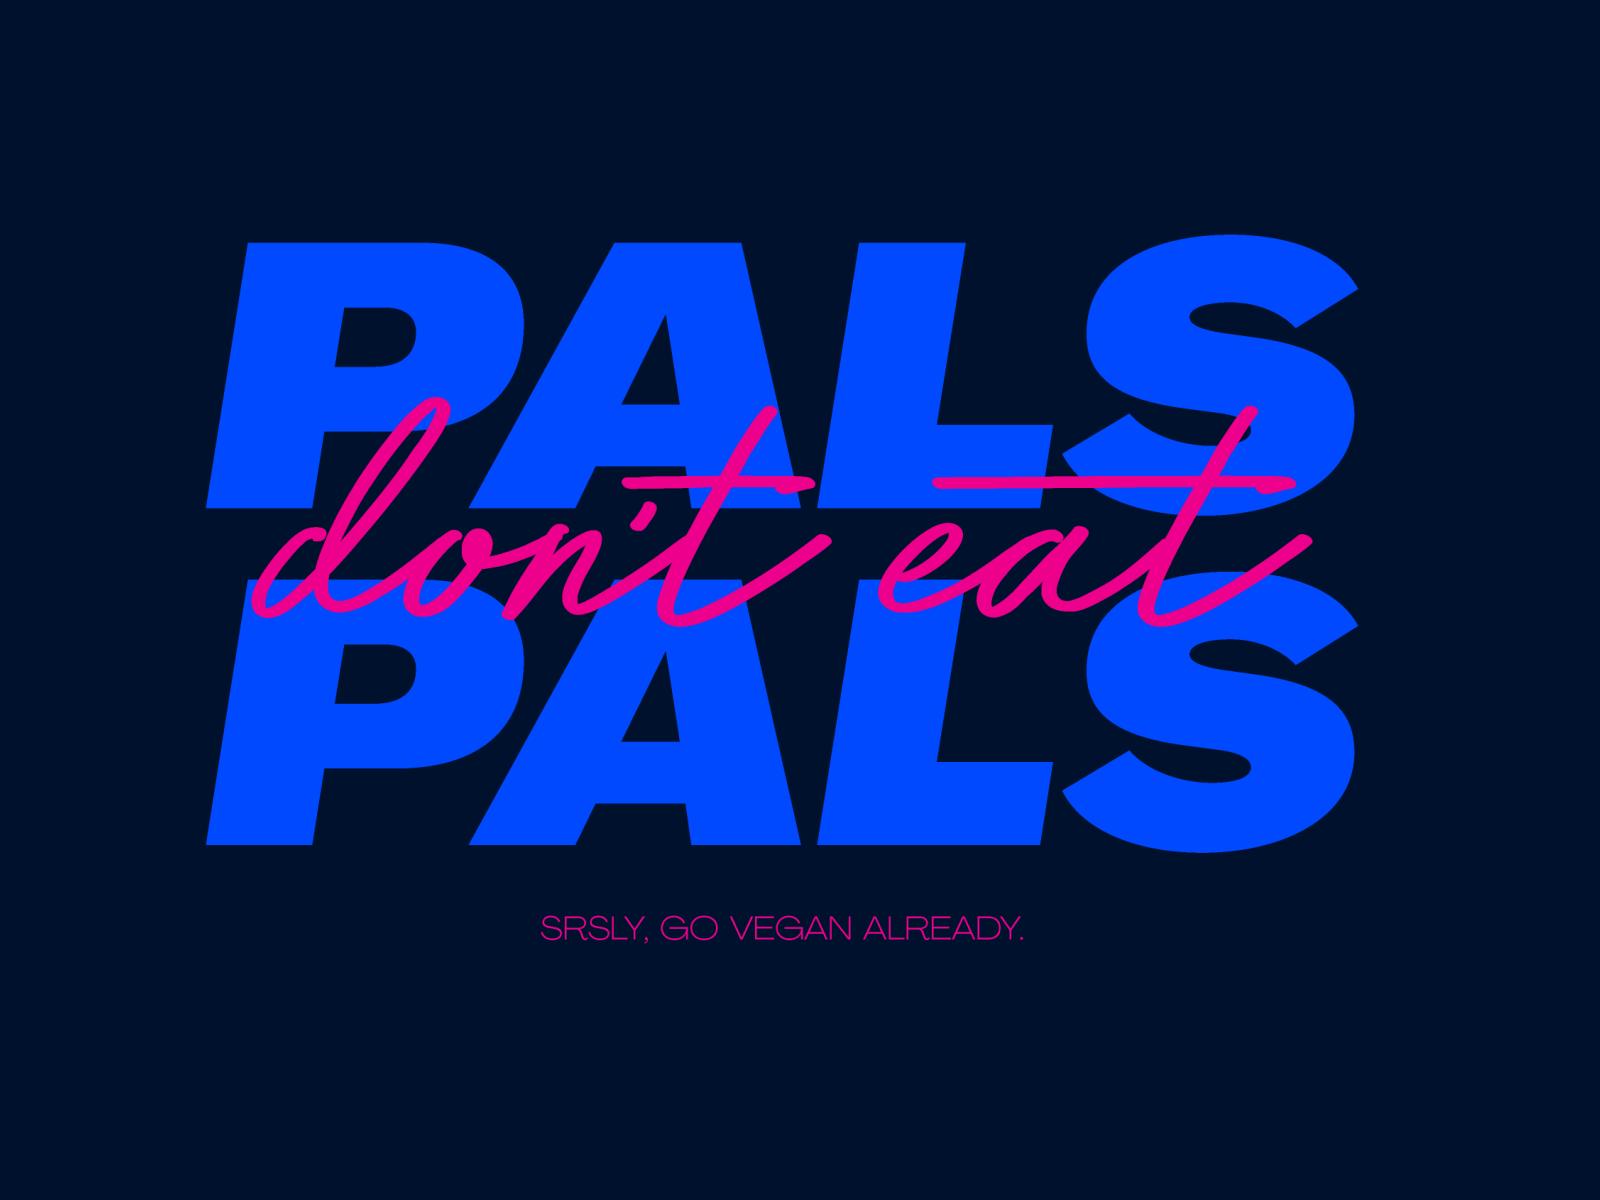 Pals don't eat pals. Srsly, go vegan already.